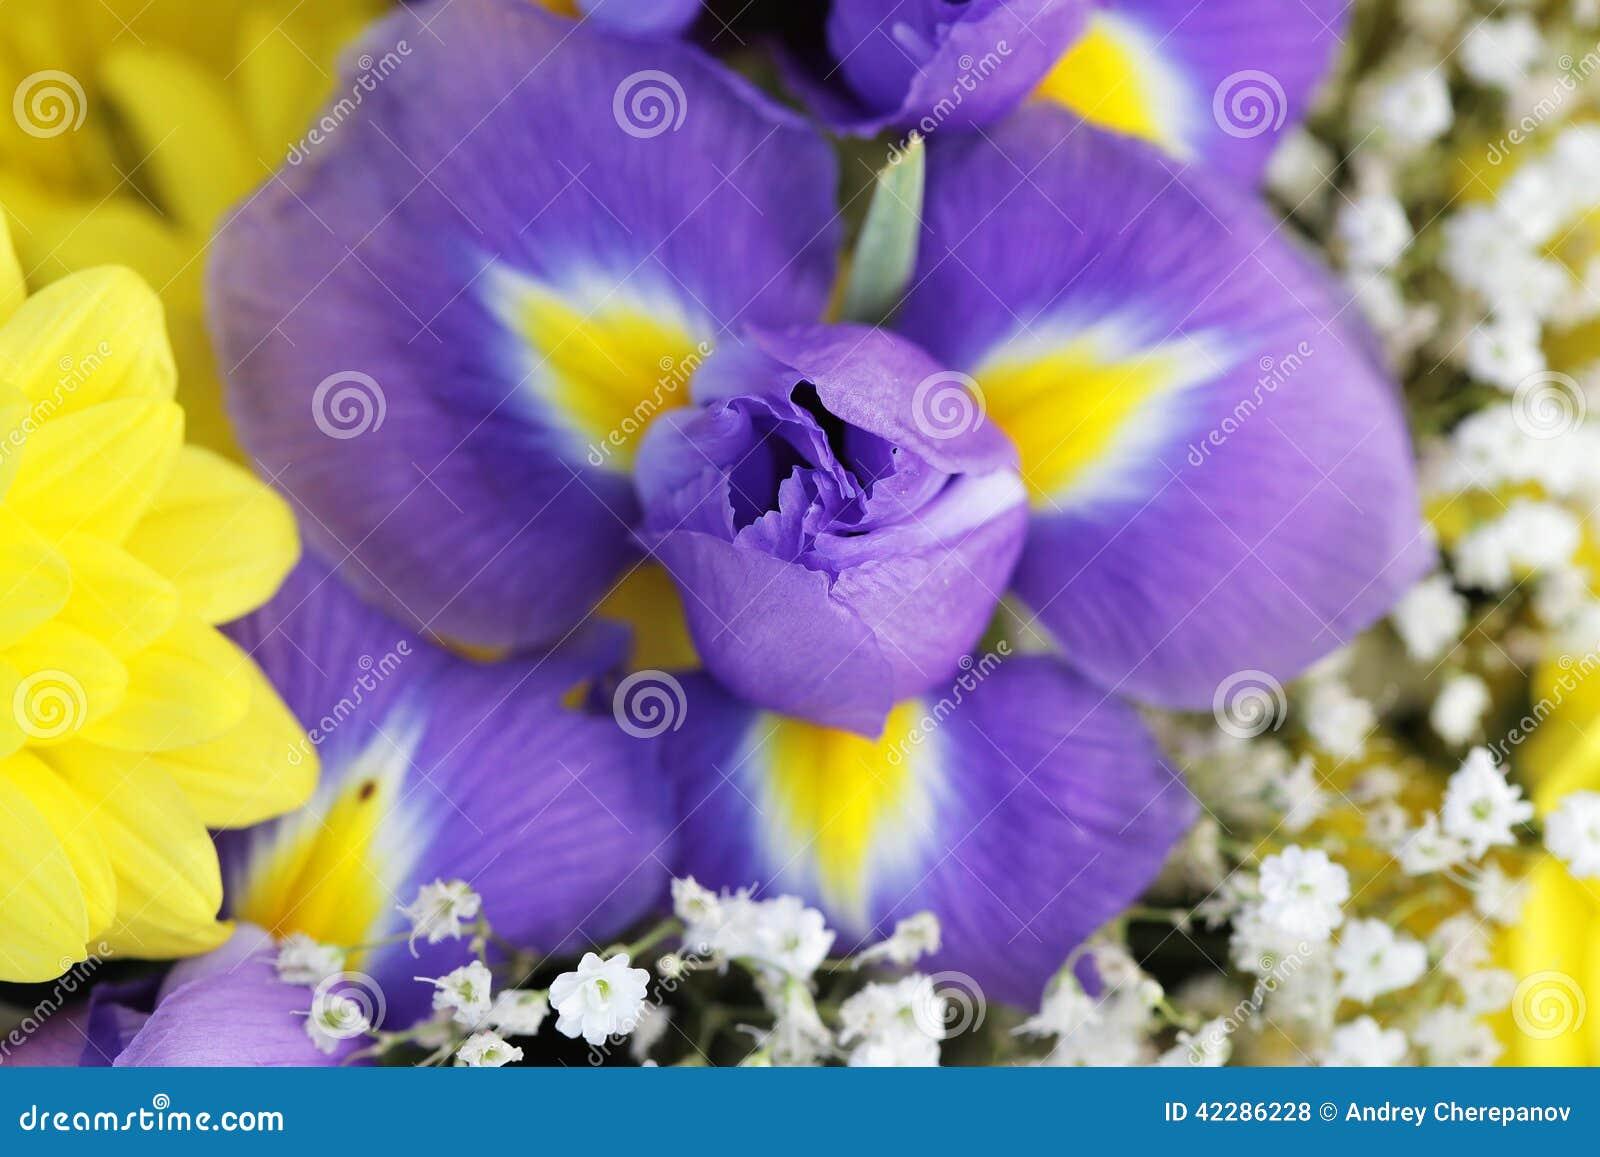 Unusual beautiful tender iris and yellow flowers background stock download unusual beautiful tender iris and yellow flowers background stock photo image of background izmirmasajfo